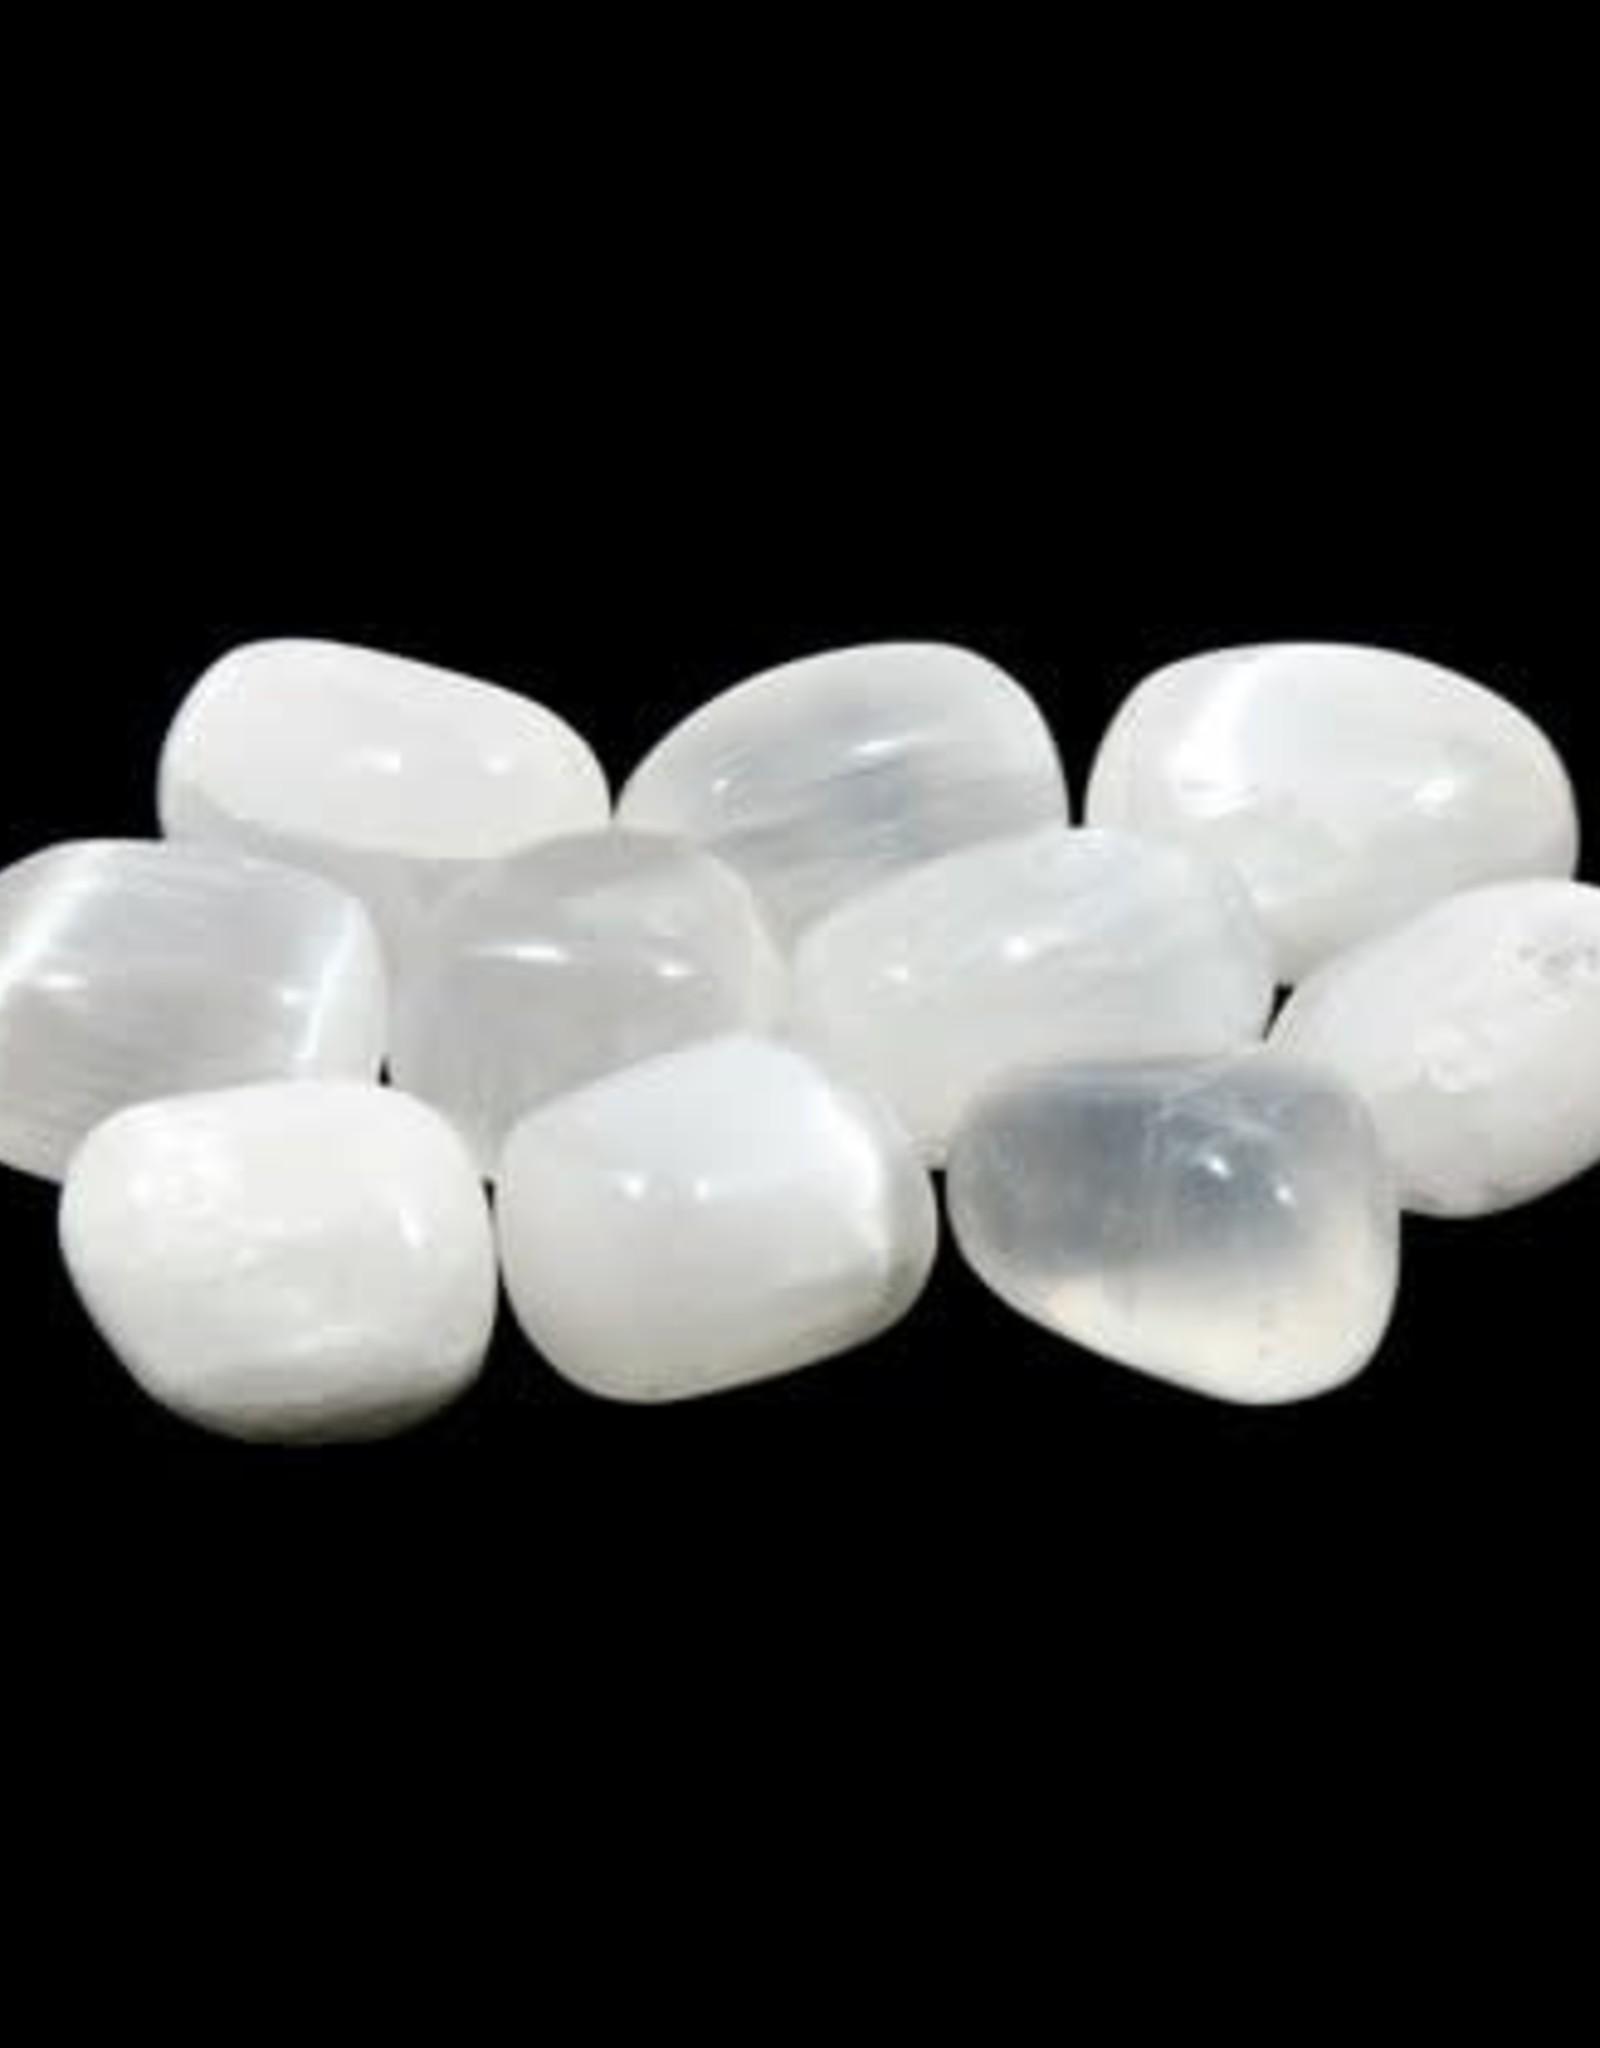 Selenite Tumblled Stone